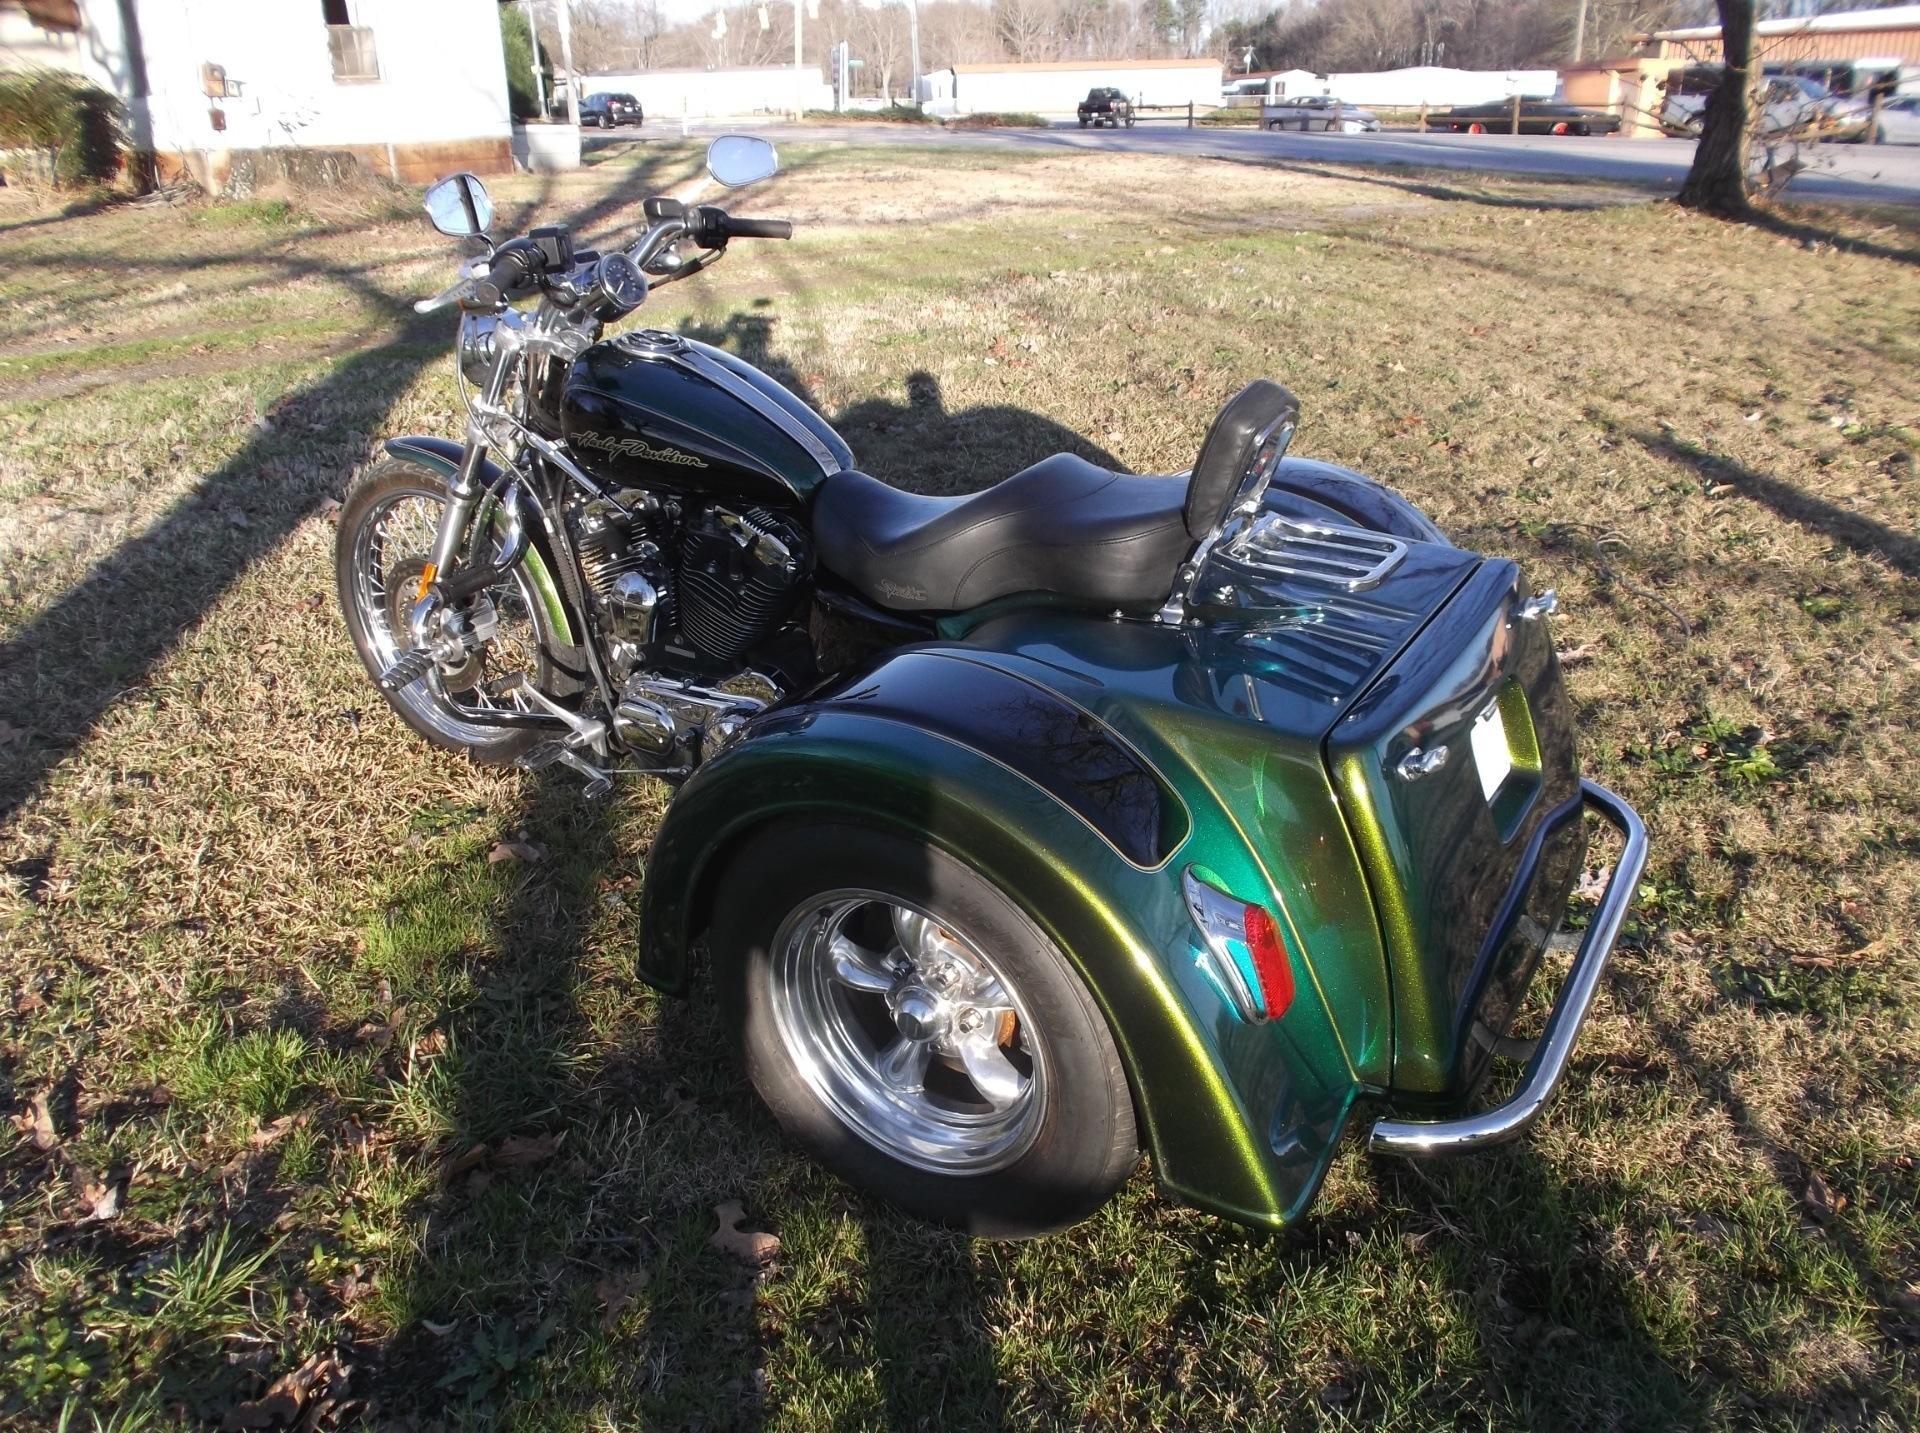 2006 Harley-Davidson XL1200 MOTORTRIKE 10